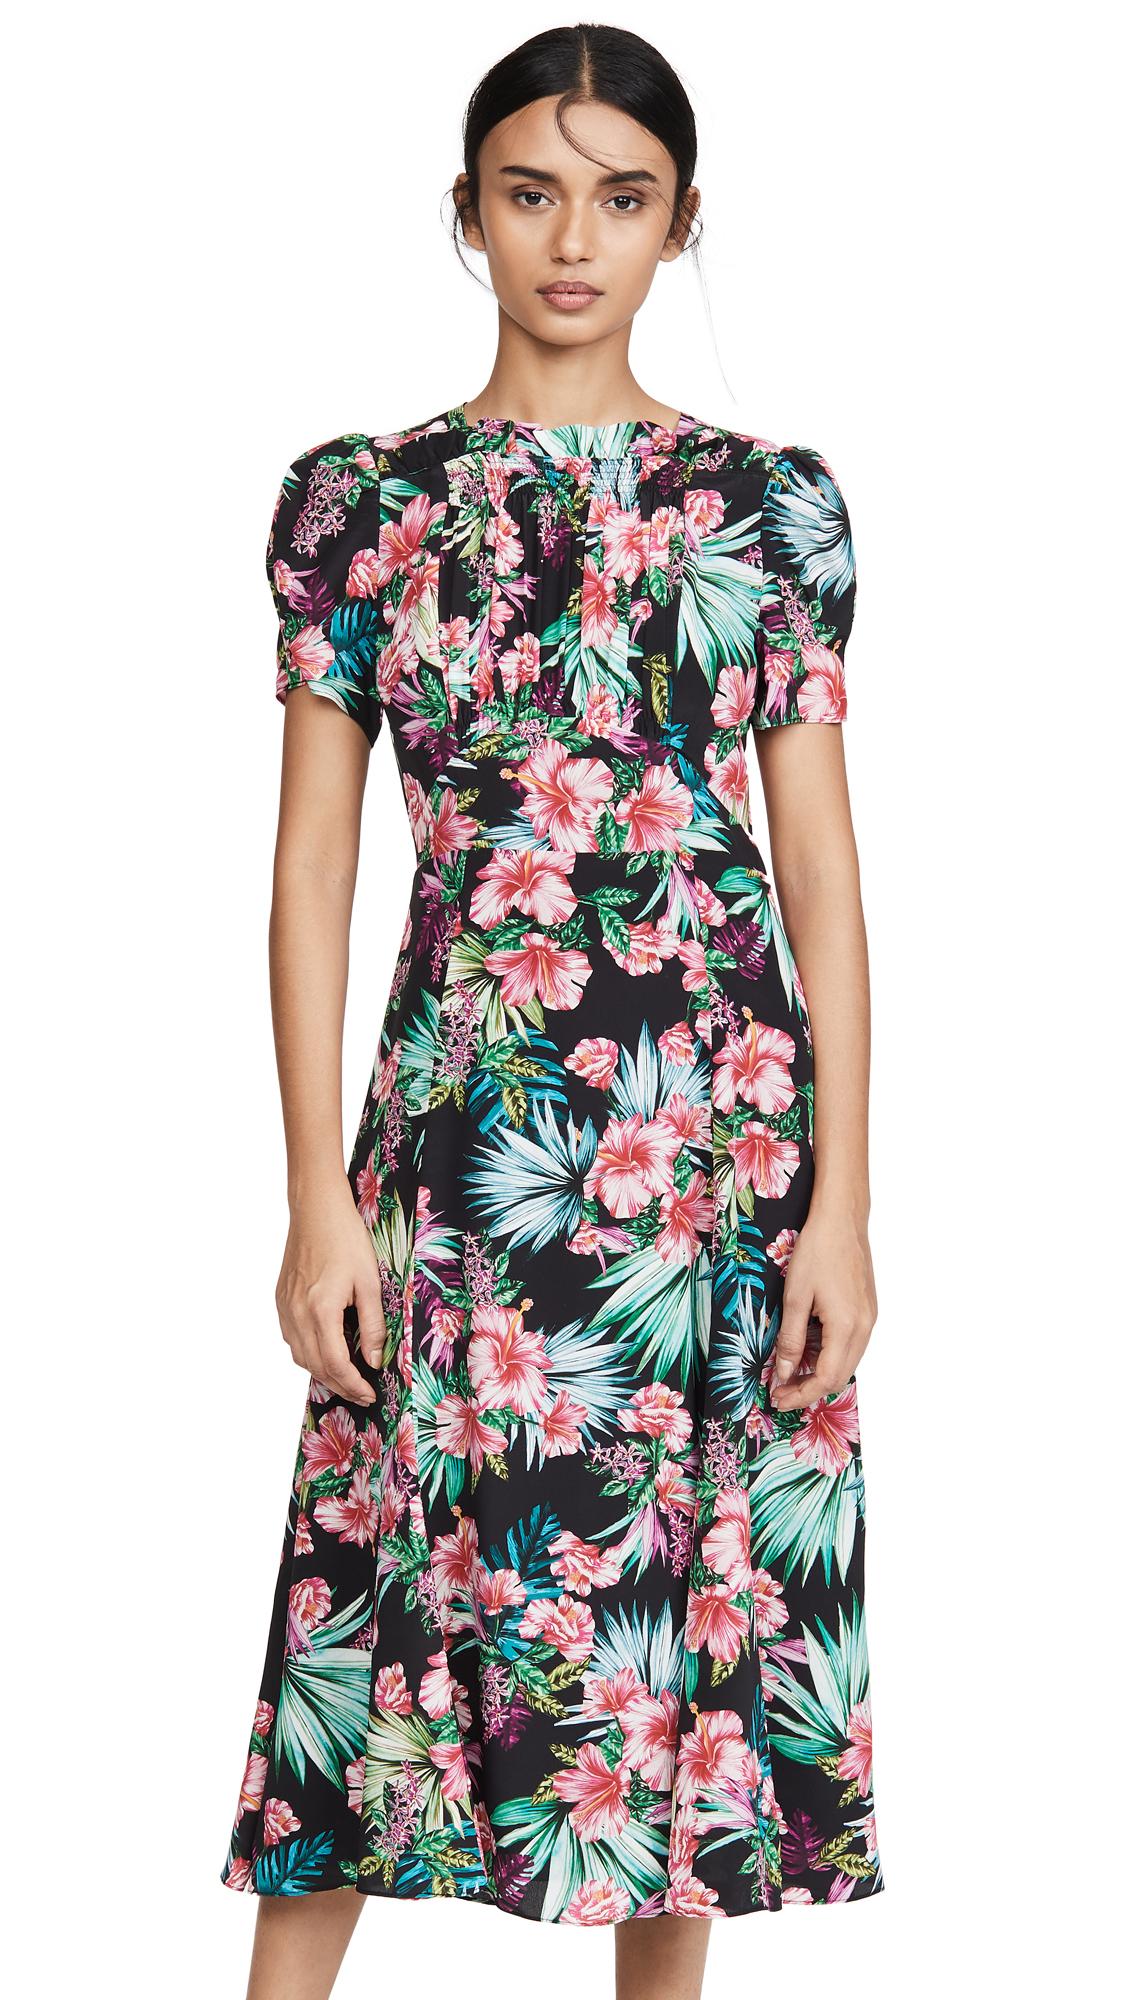 Buy LES REVERIES Smocked Front Dress online beautiful LES REVERIES Clothing, Dresses